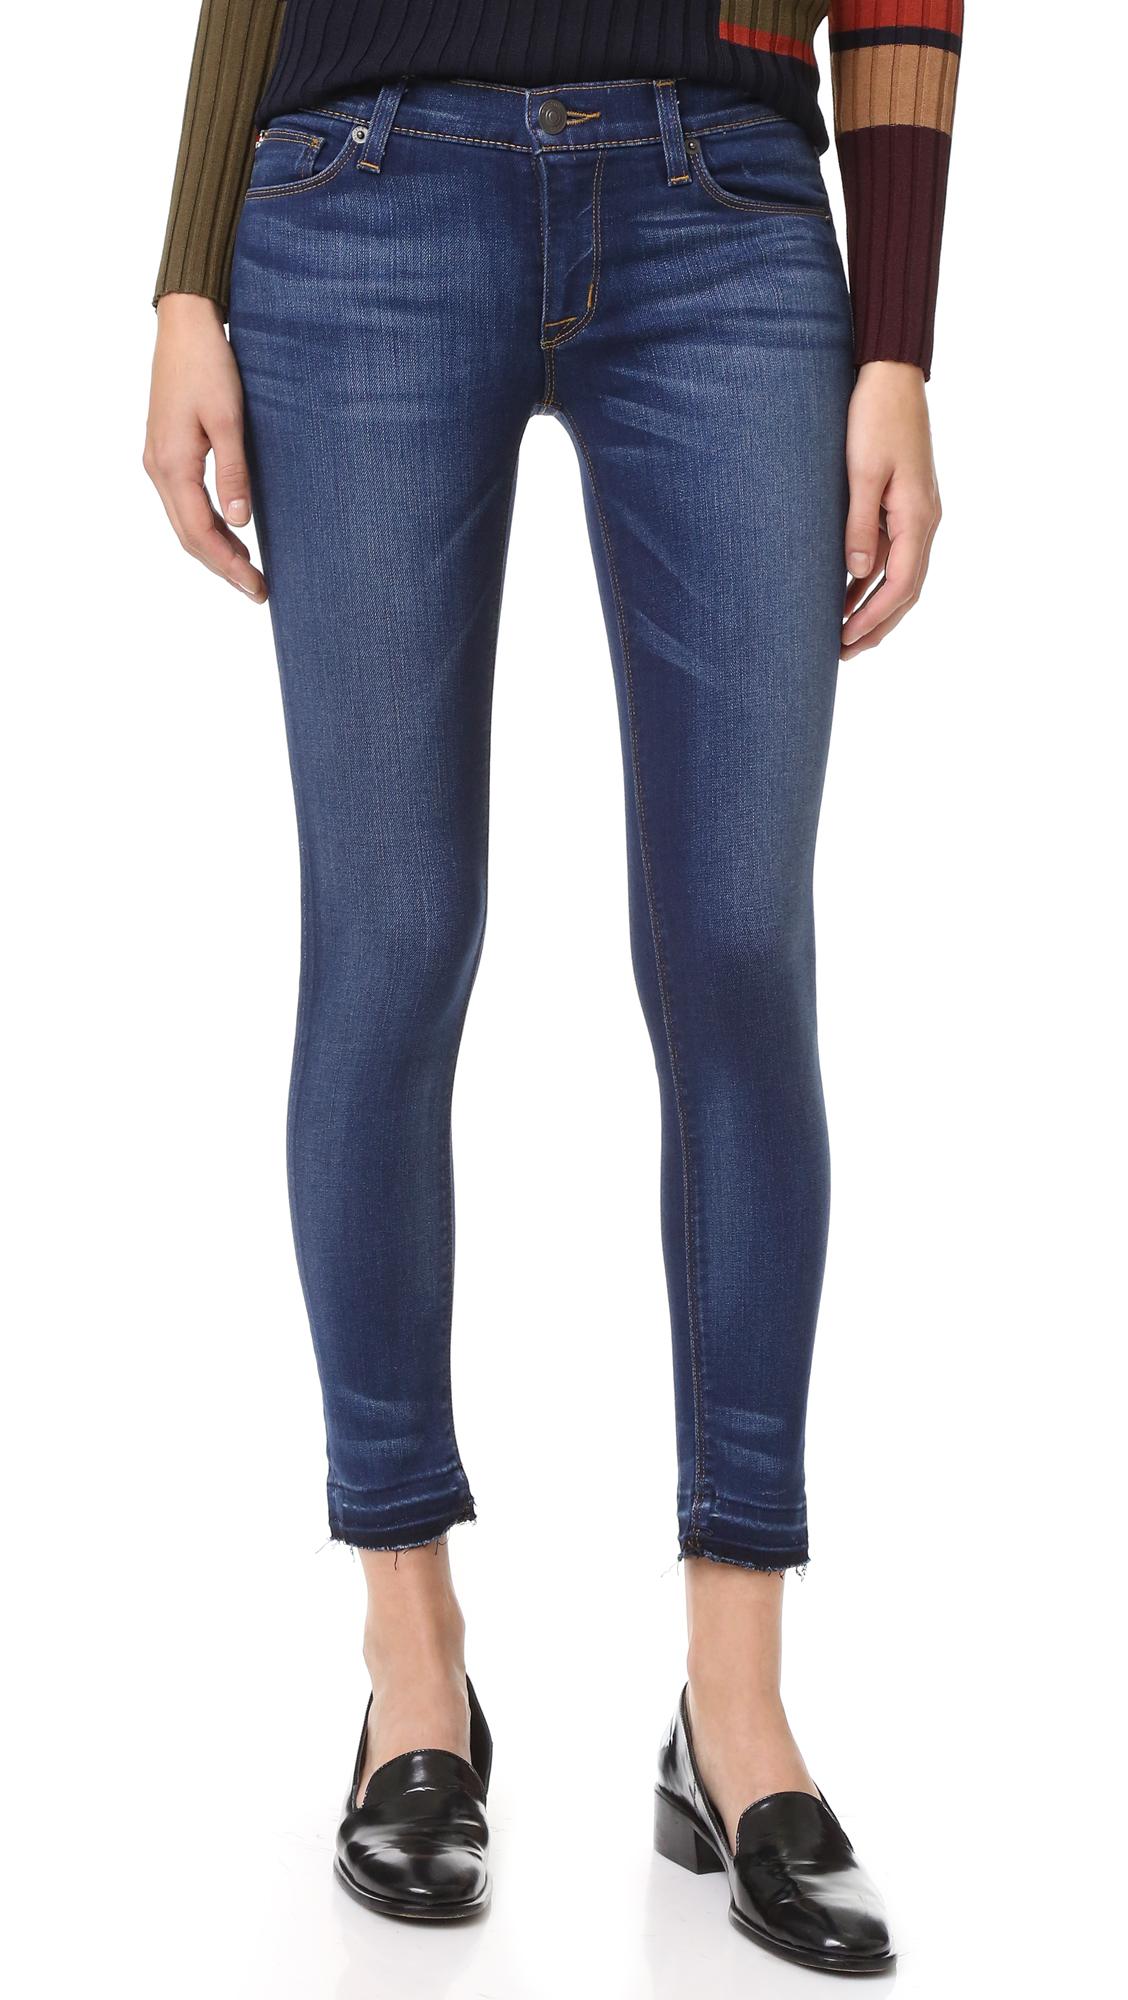 Hudson Krista Cropped Skinny Jeans - Revelations at Shopbop